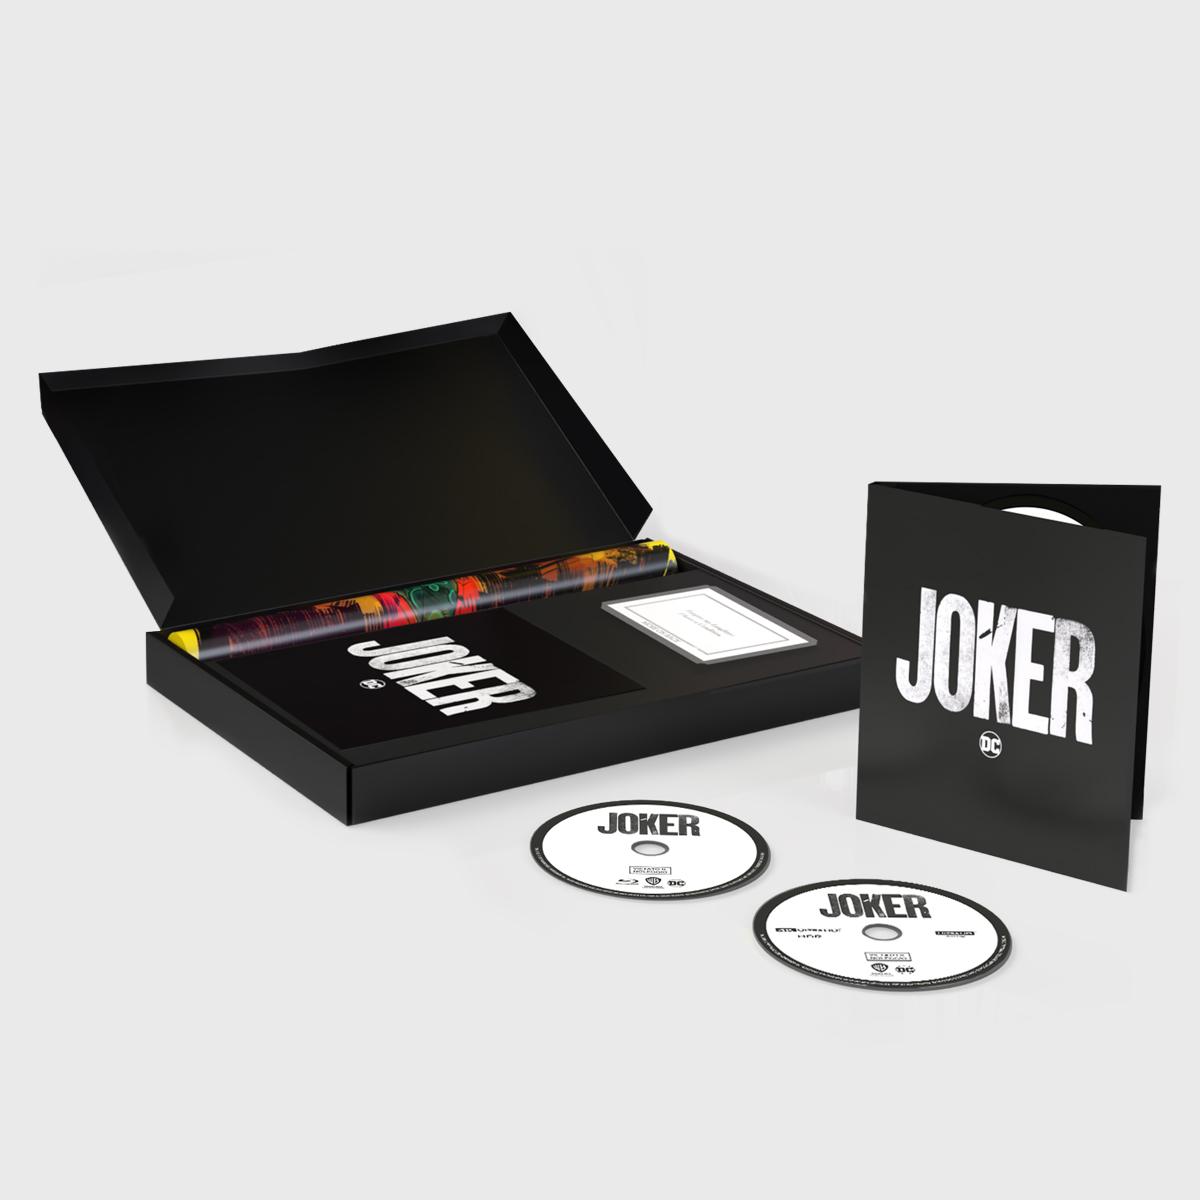 Joker Collector's Edition